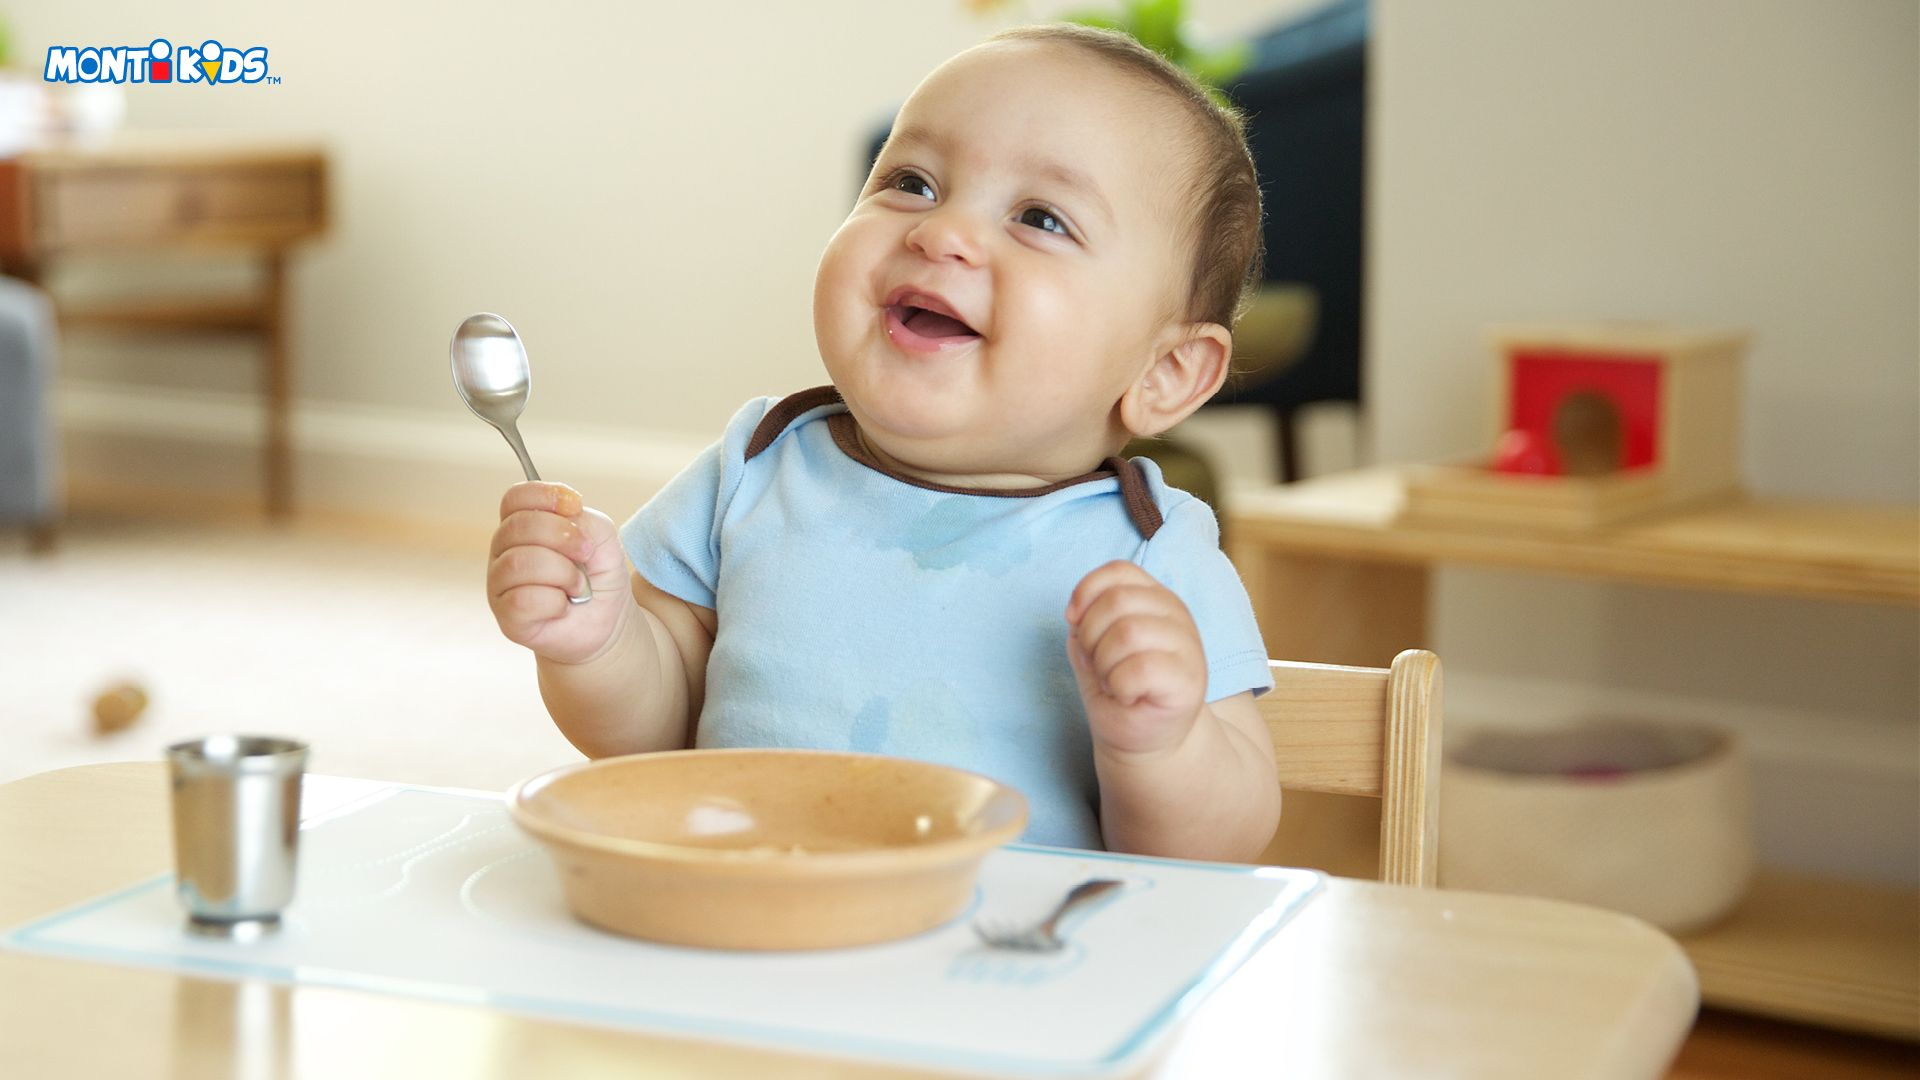 76925377dbdc3859a052d12ee186ab2b - How To Get Baby To Eat From A Spoon